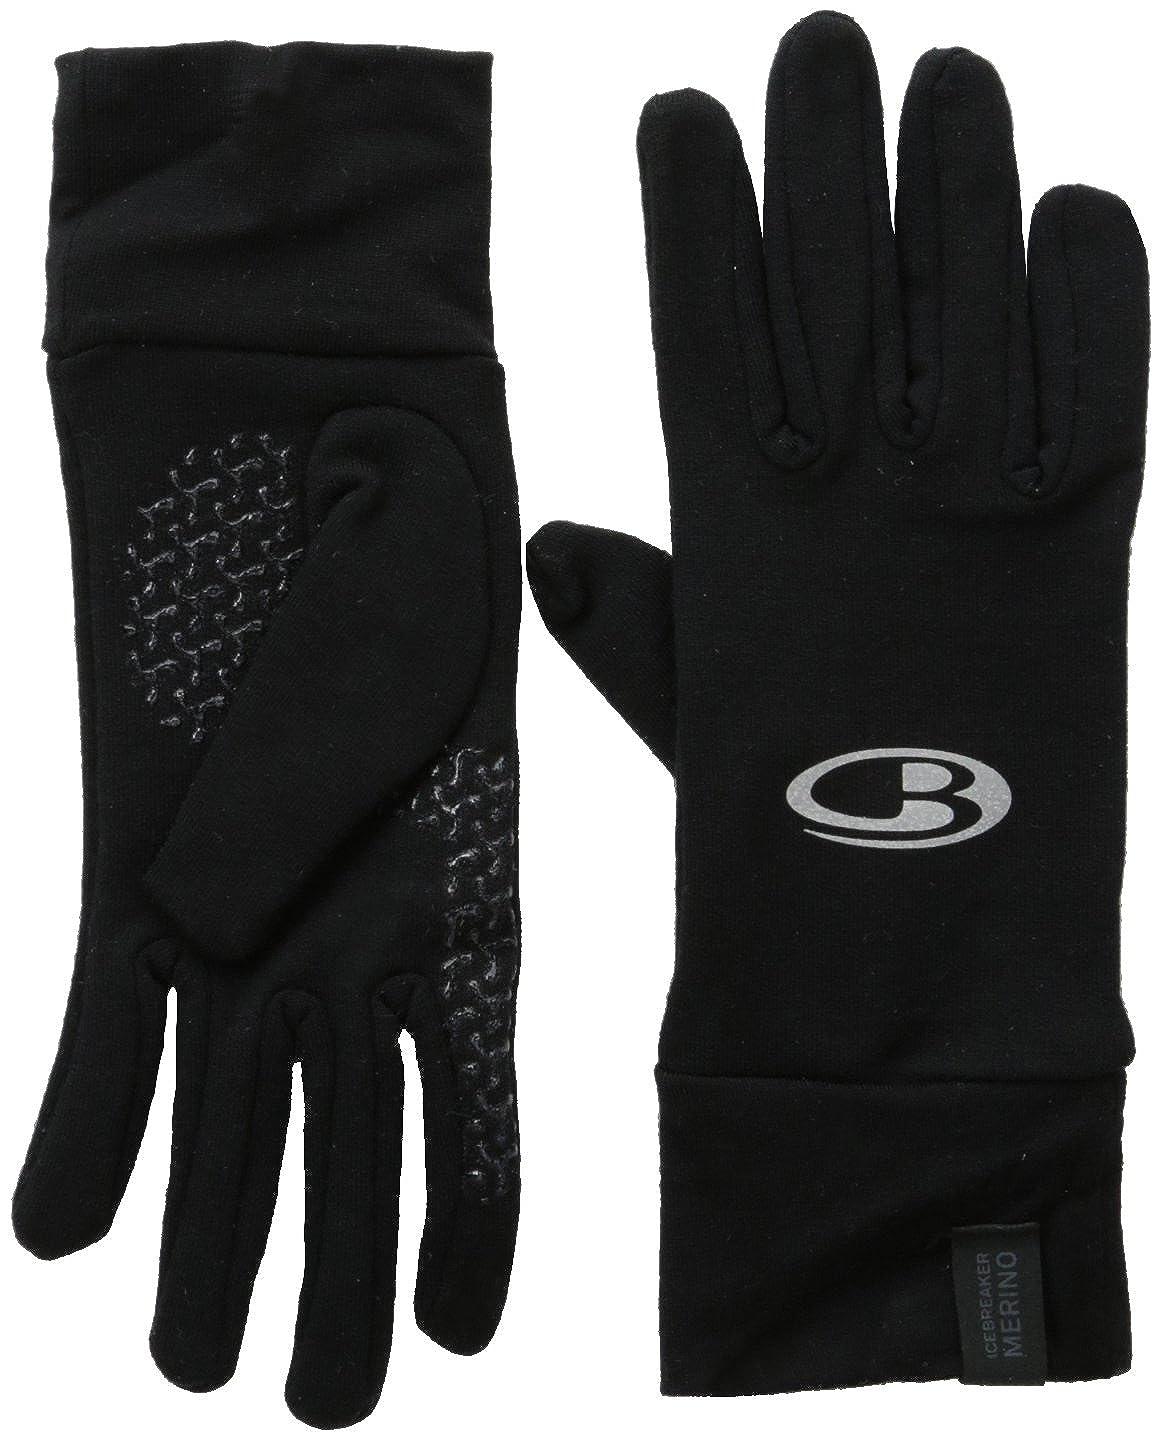 ec4a61e539 Amazon.com: Icebreaker Men's Quantum Glove, Black, X-Large: Clothing